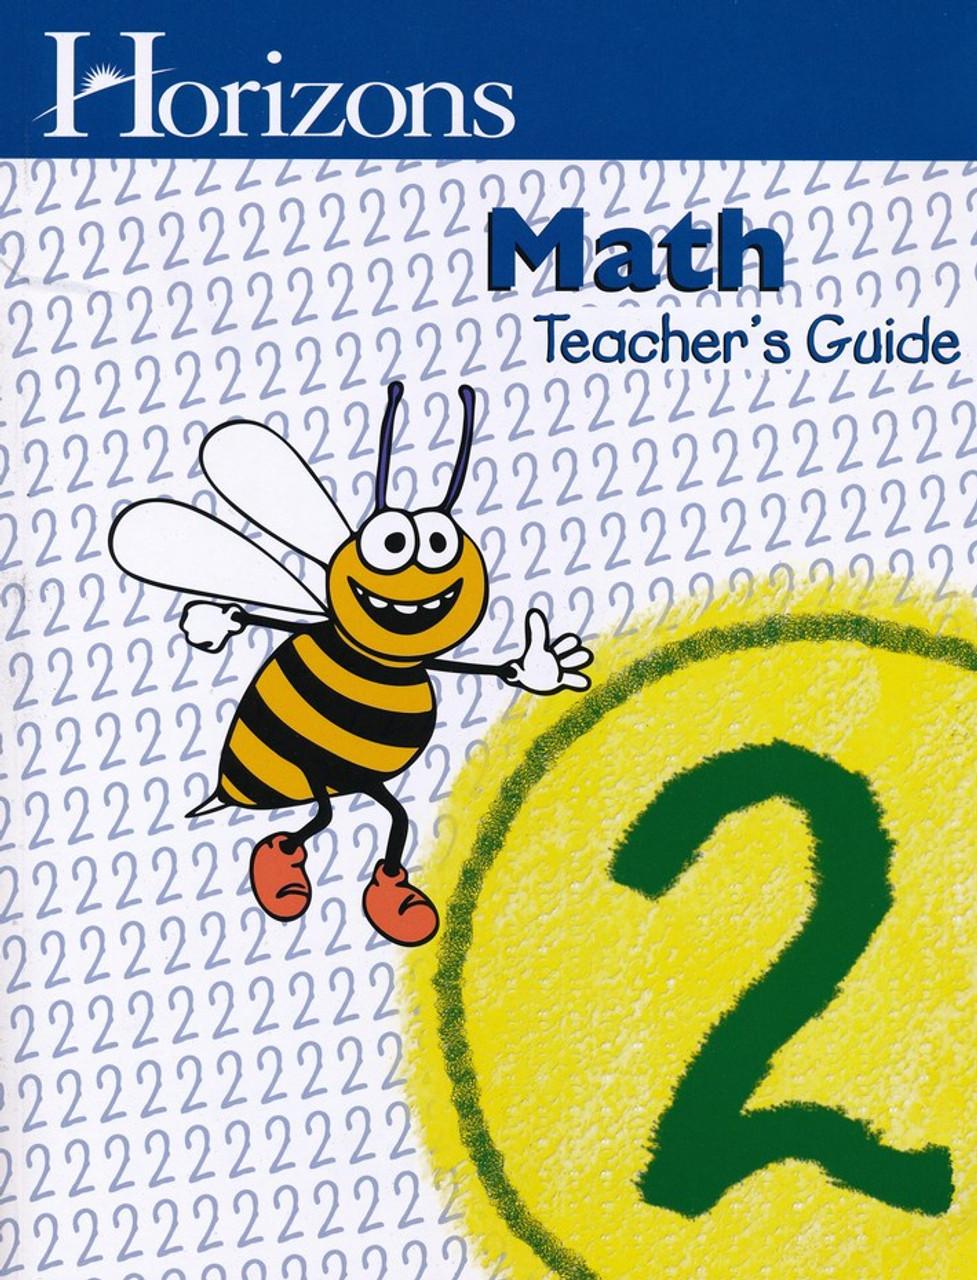 medium resolution of Horizons Grade 2 Teachers Guide - Classroom Resource Center